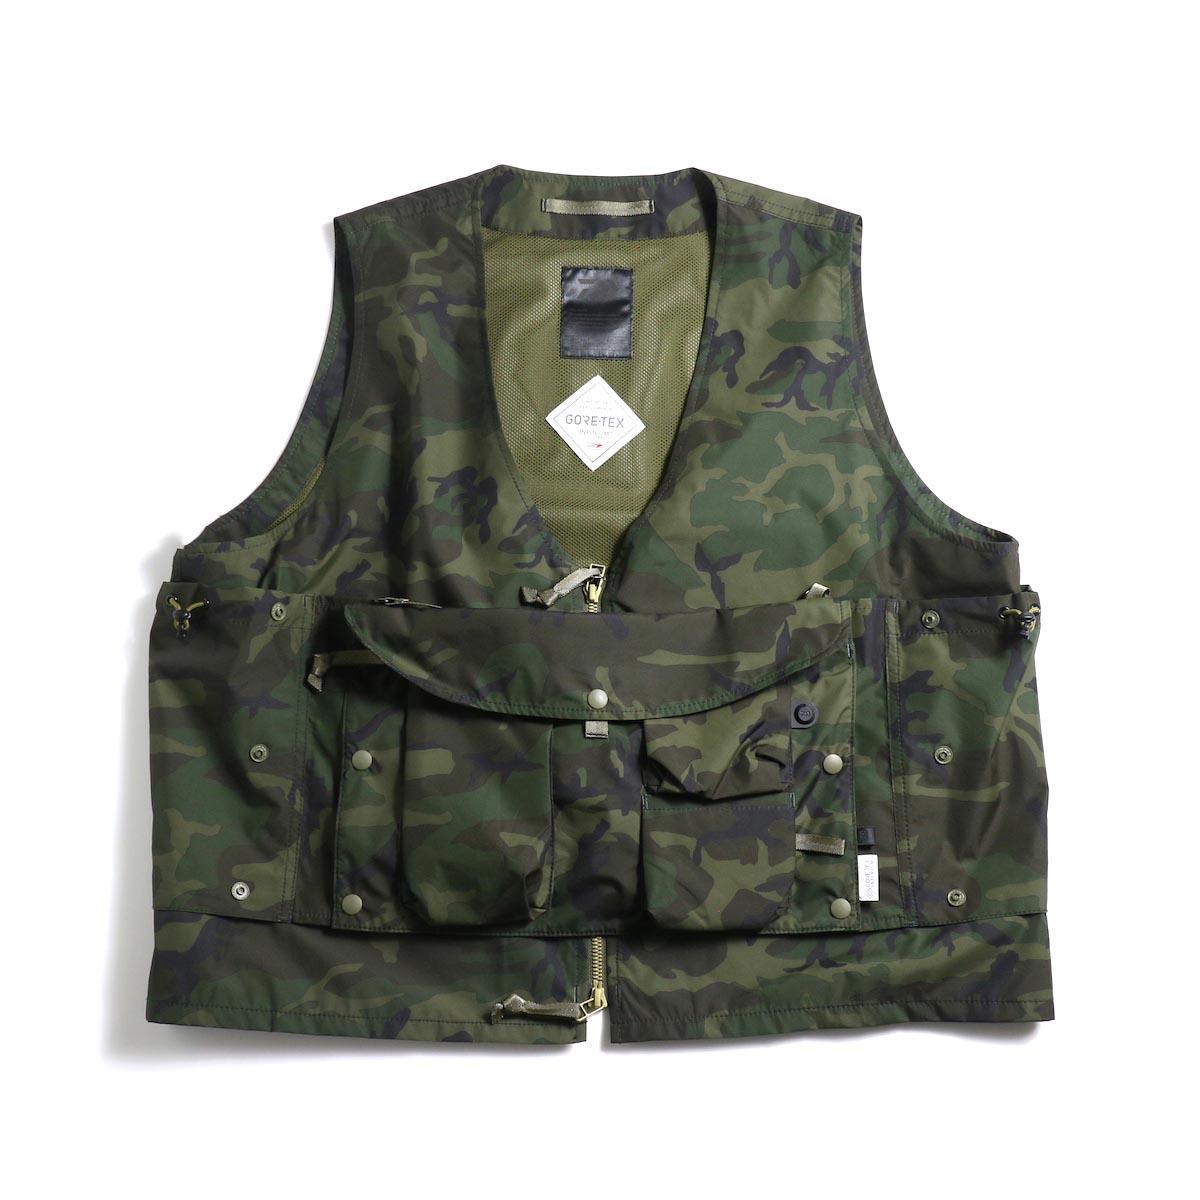 DAIWA PIER39 / GORE-TEX INFINIUM 3way Radio Vest (Green Camo)